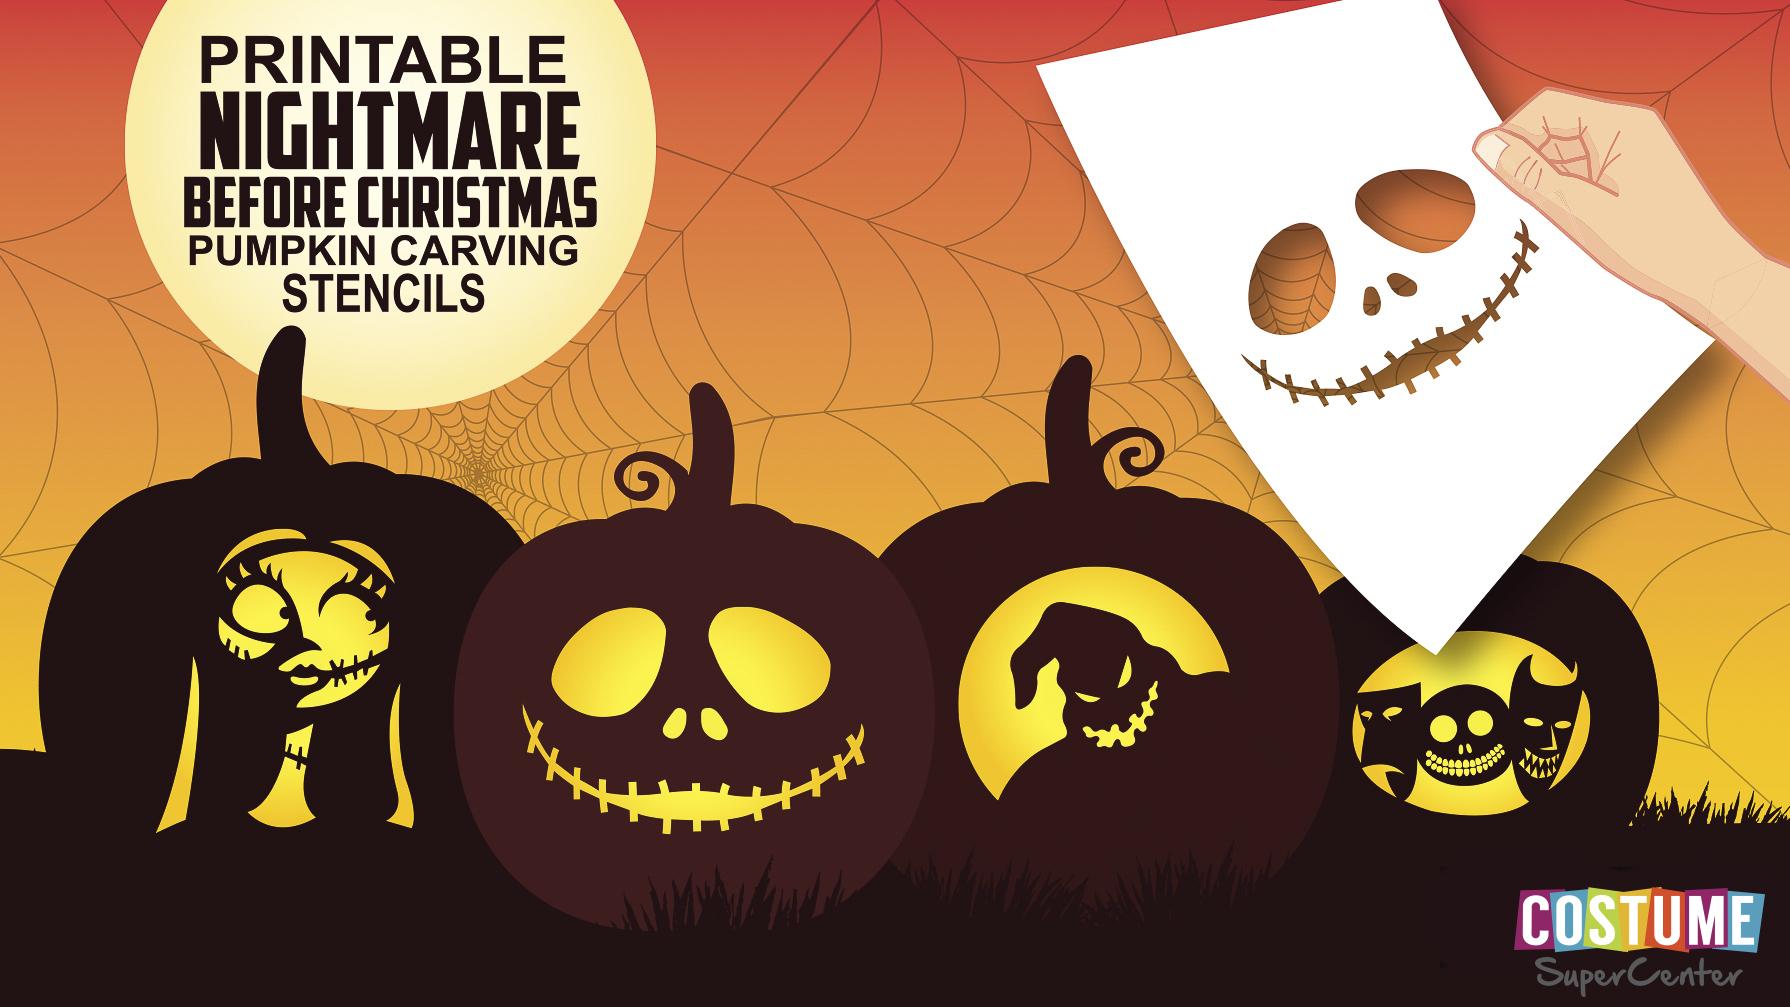 Nightmare Before Christmas Pumpkin Carving Stencils | Costume - Free Printable Nightmare Before Christmas Pumpkin Stencils